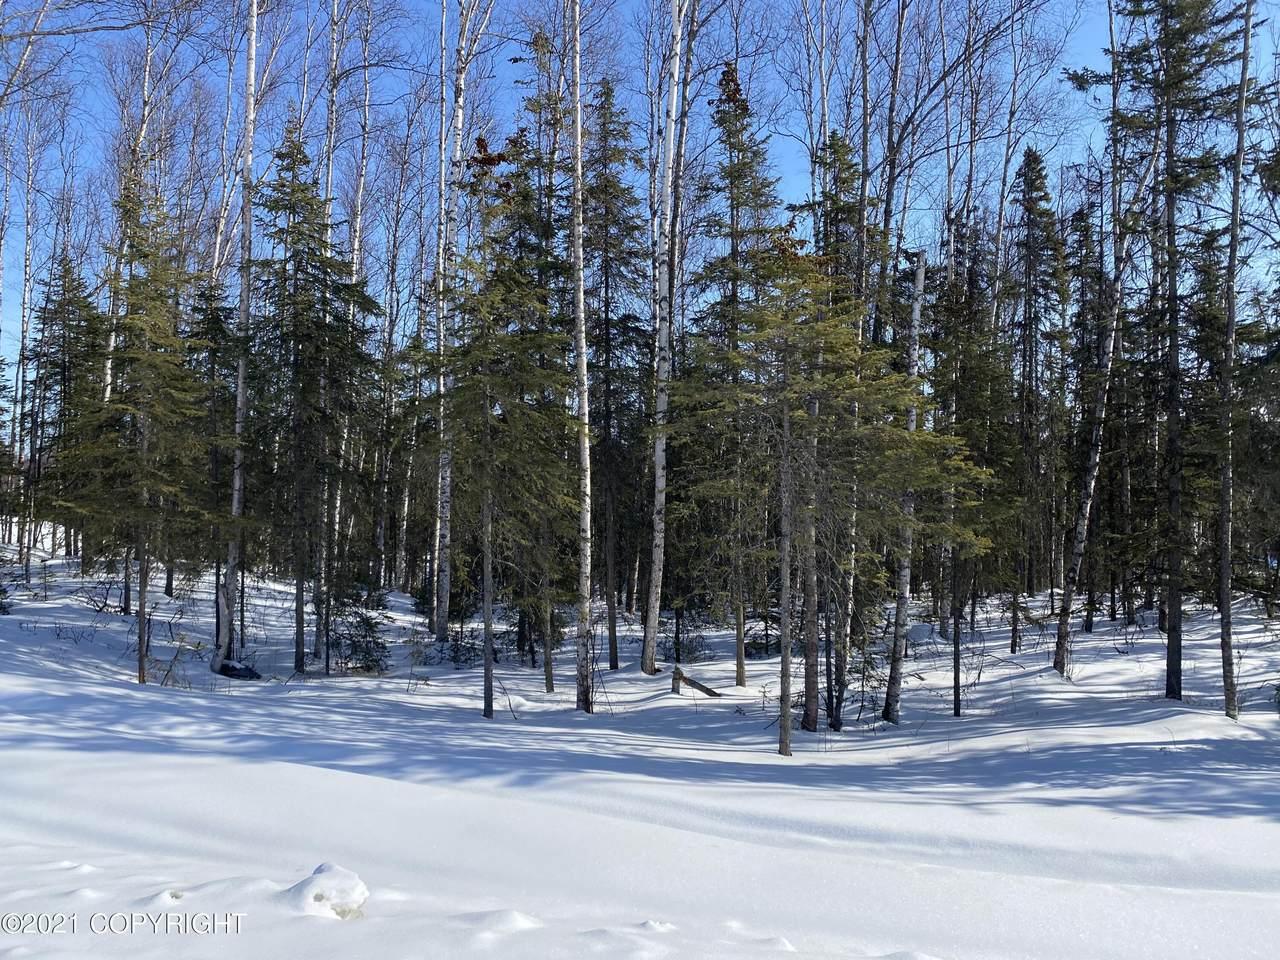 https://bt-photos.global.ssl.fastly.net/alaska/1280_boomver_1_21-4112-2.jpg